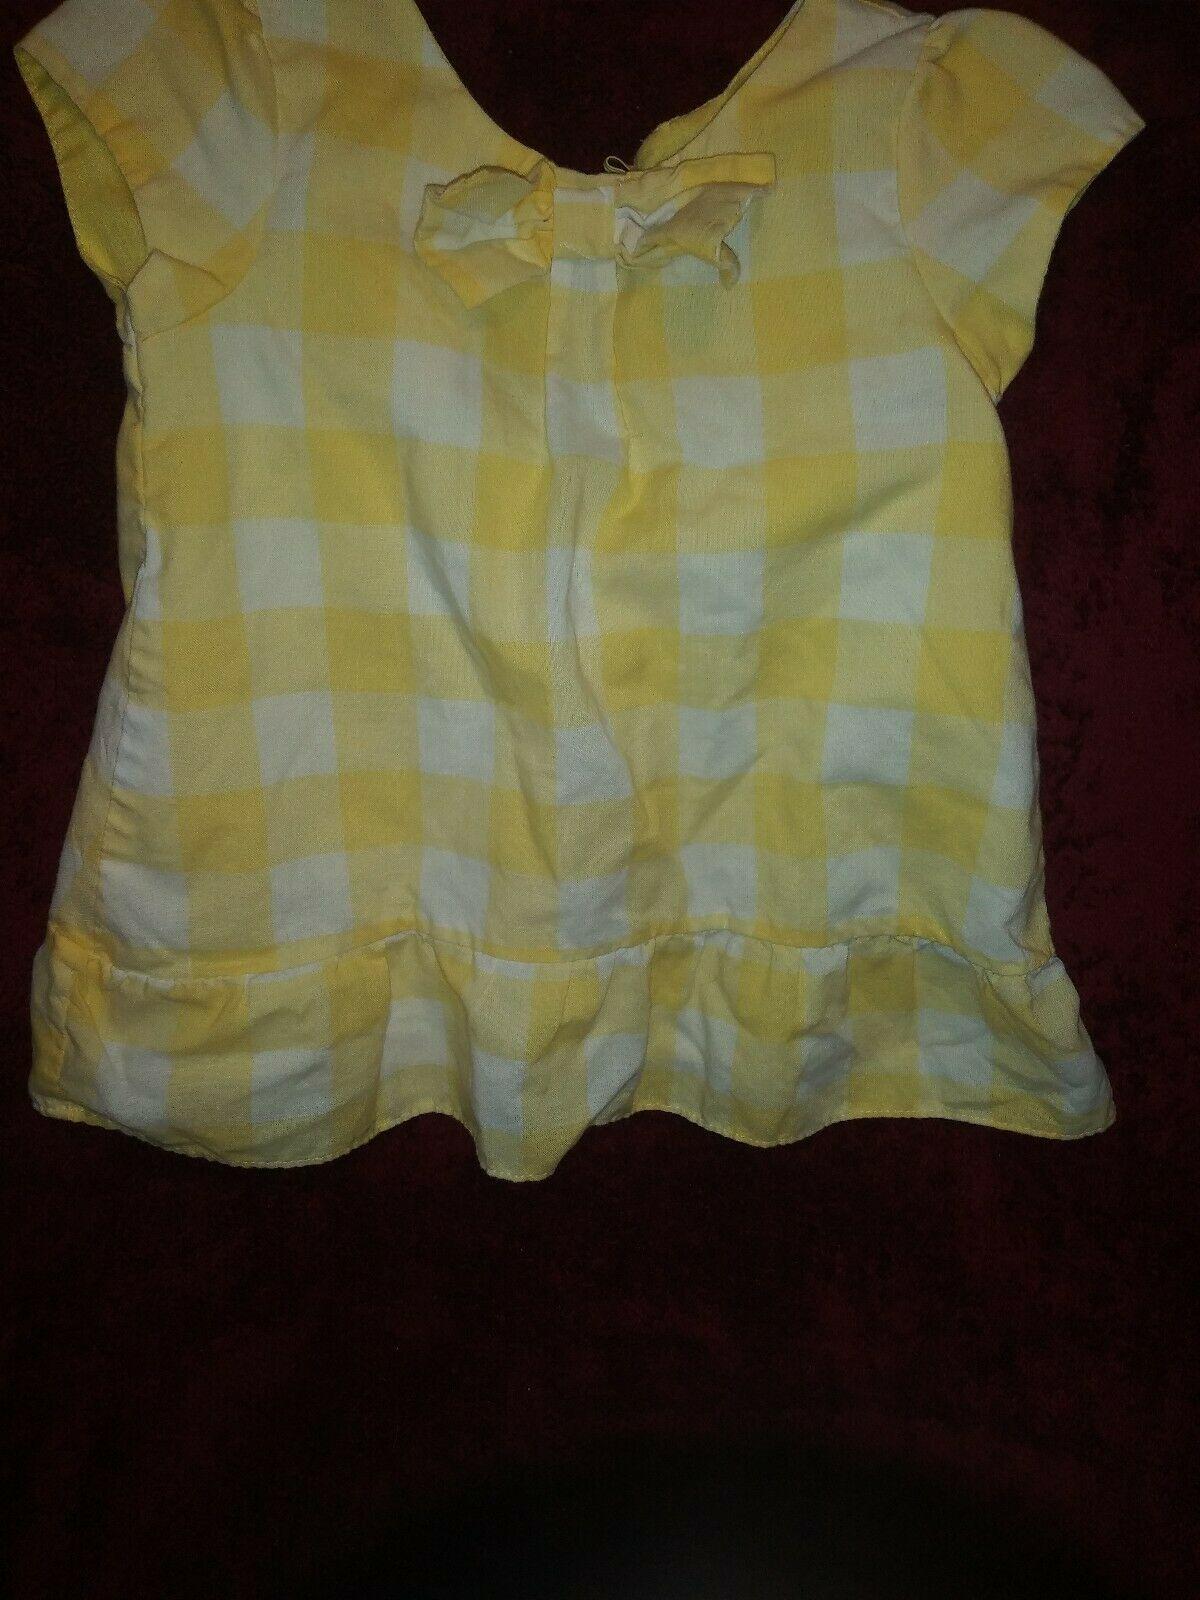 Abs Kids Adorable Yellow&White Checkered? Dress Toddler Girls Sz 18 Months - $13.85